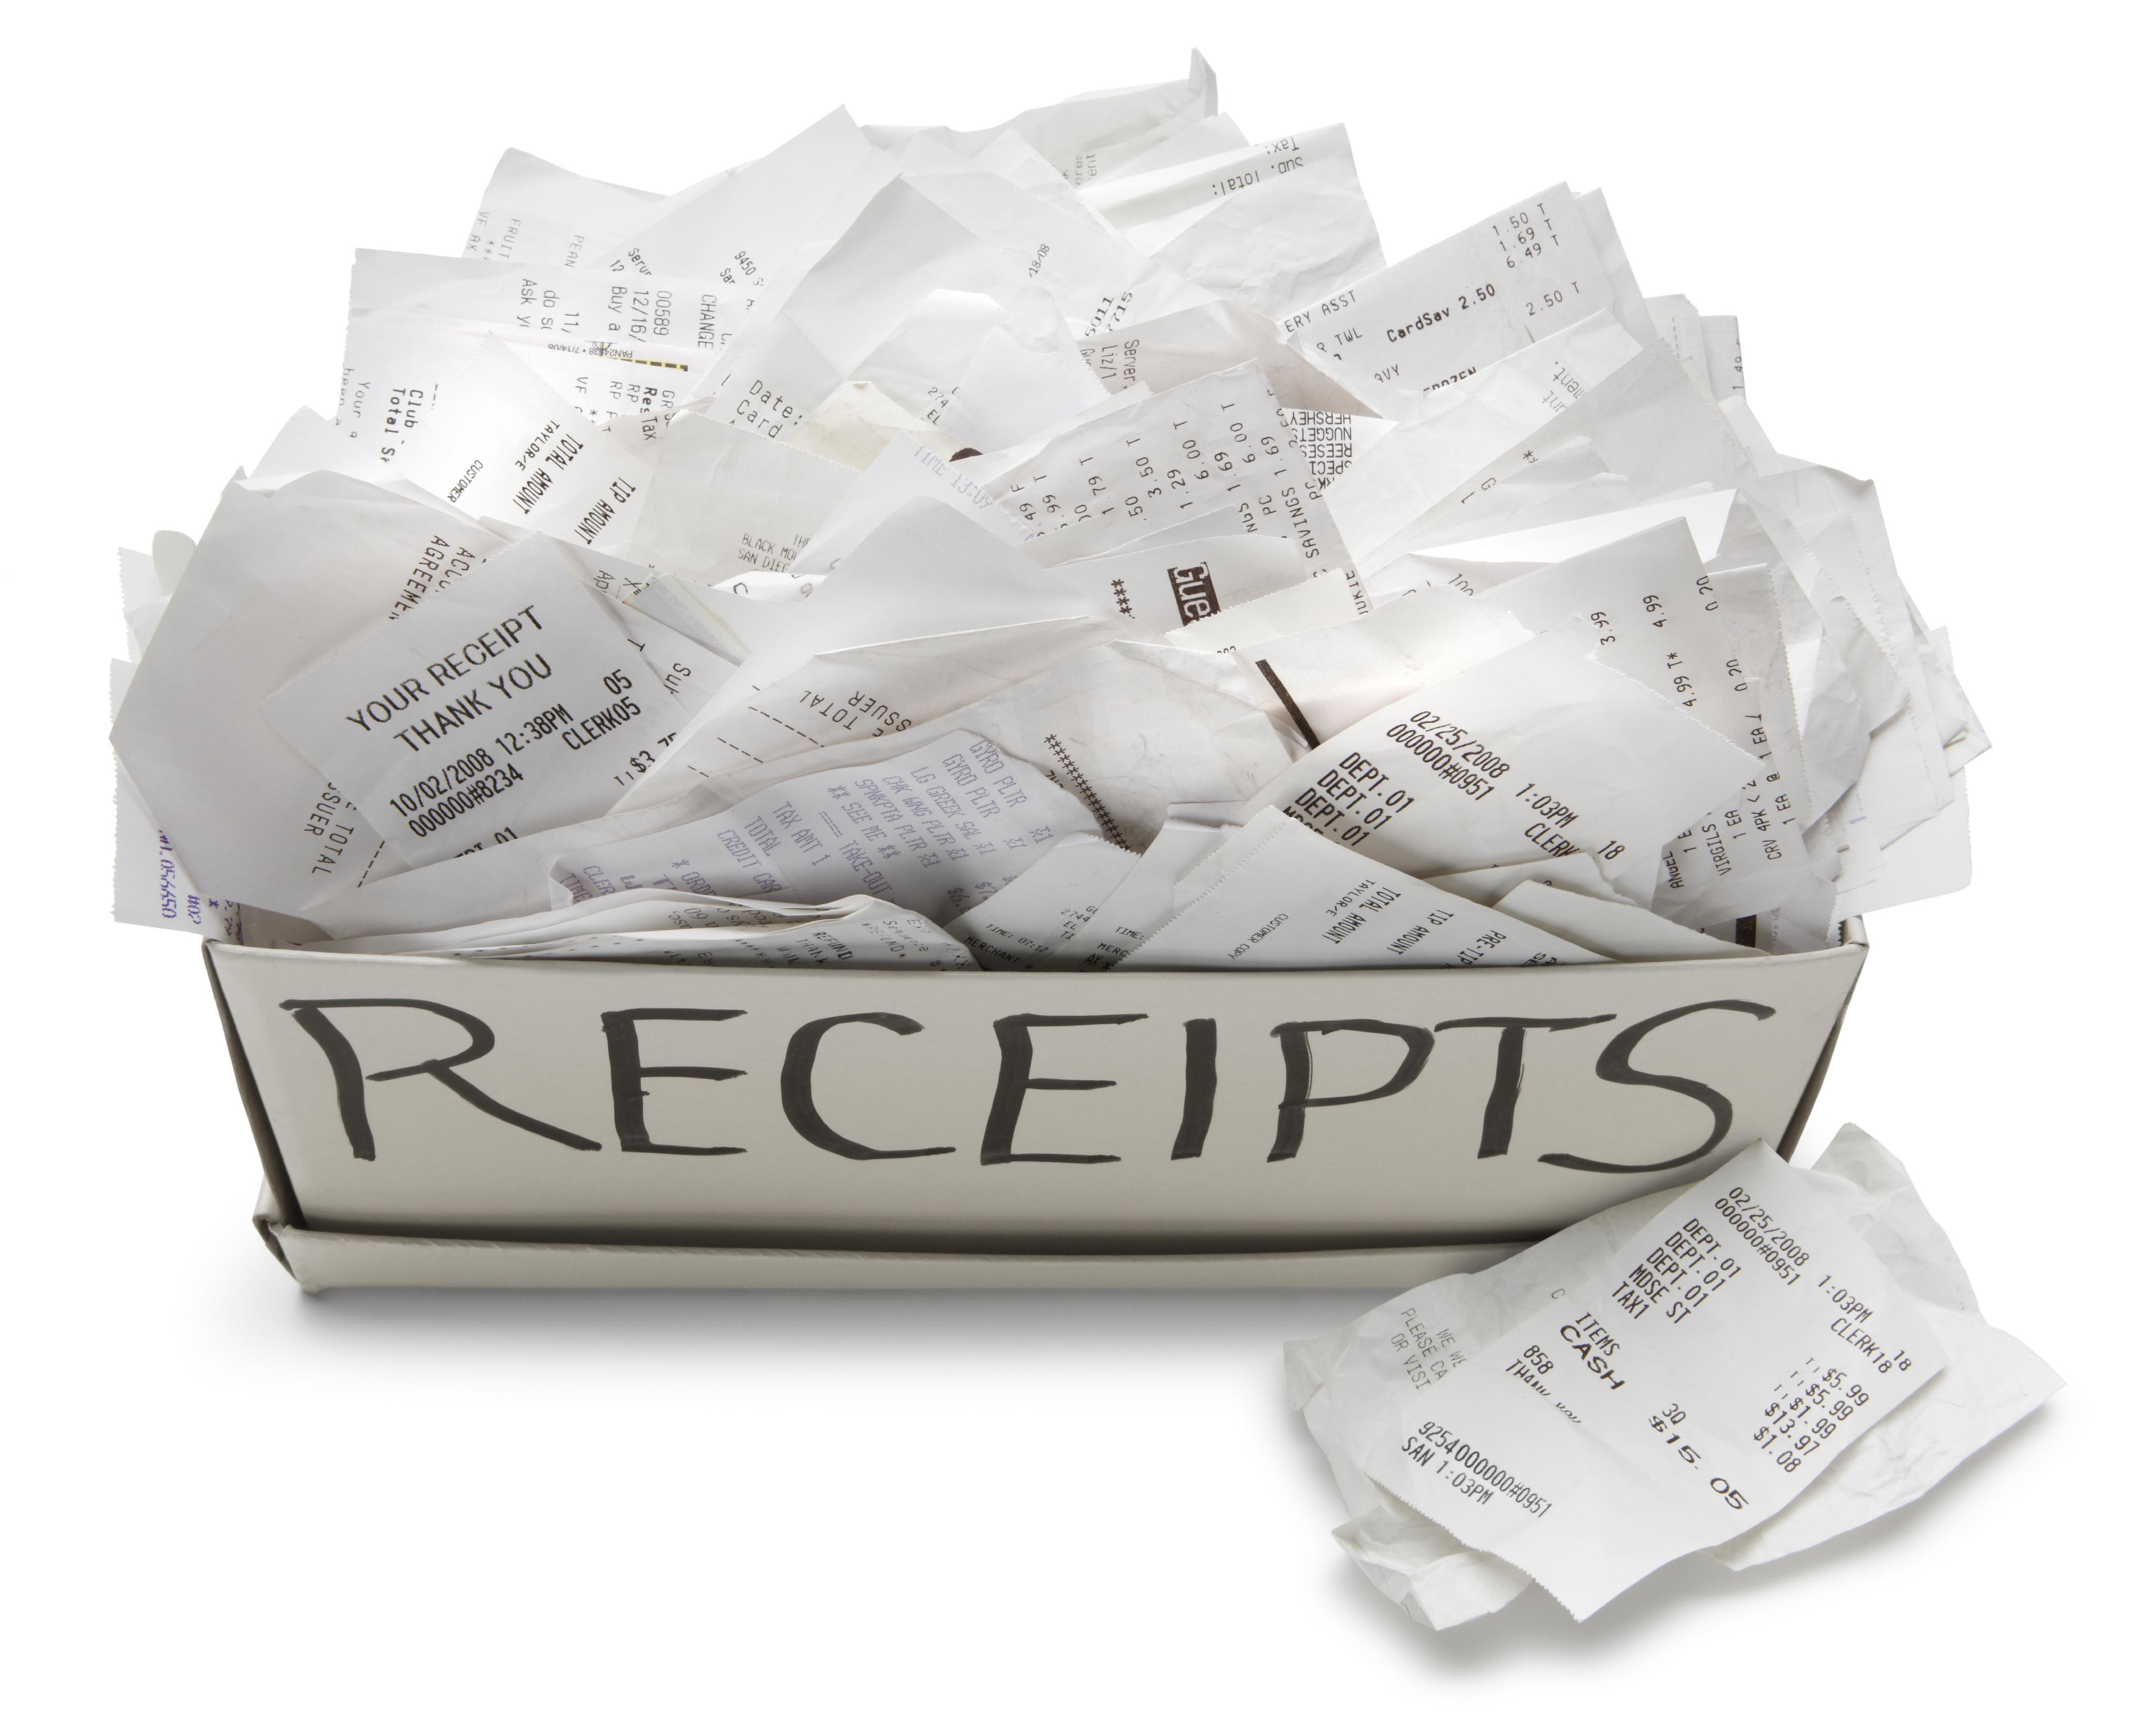 paper receipts-boss magazine